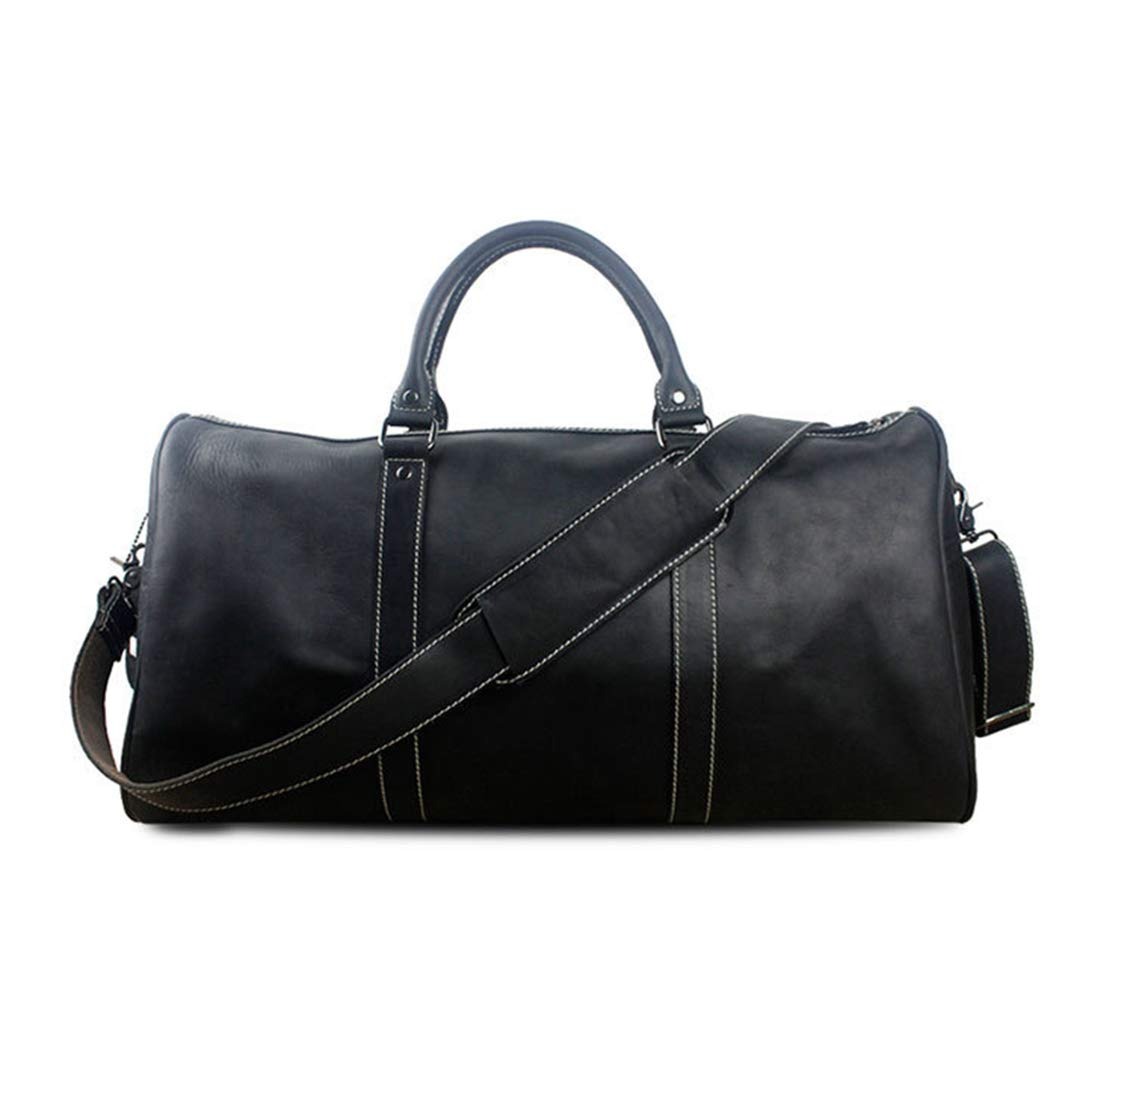 CAFUTY 大容量トラベルバッグチェック柄ファッショントラベルショルダーバッグレザーマンバッグ短距離トラベルメンズハンドバッグ荷物袋 (Color : ブラック) B07MXCZ6J2 ブラック